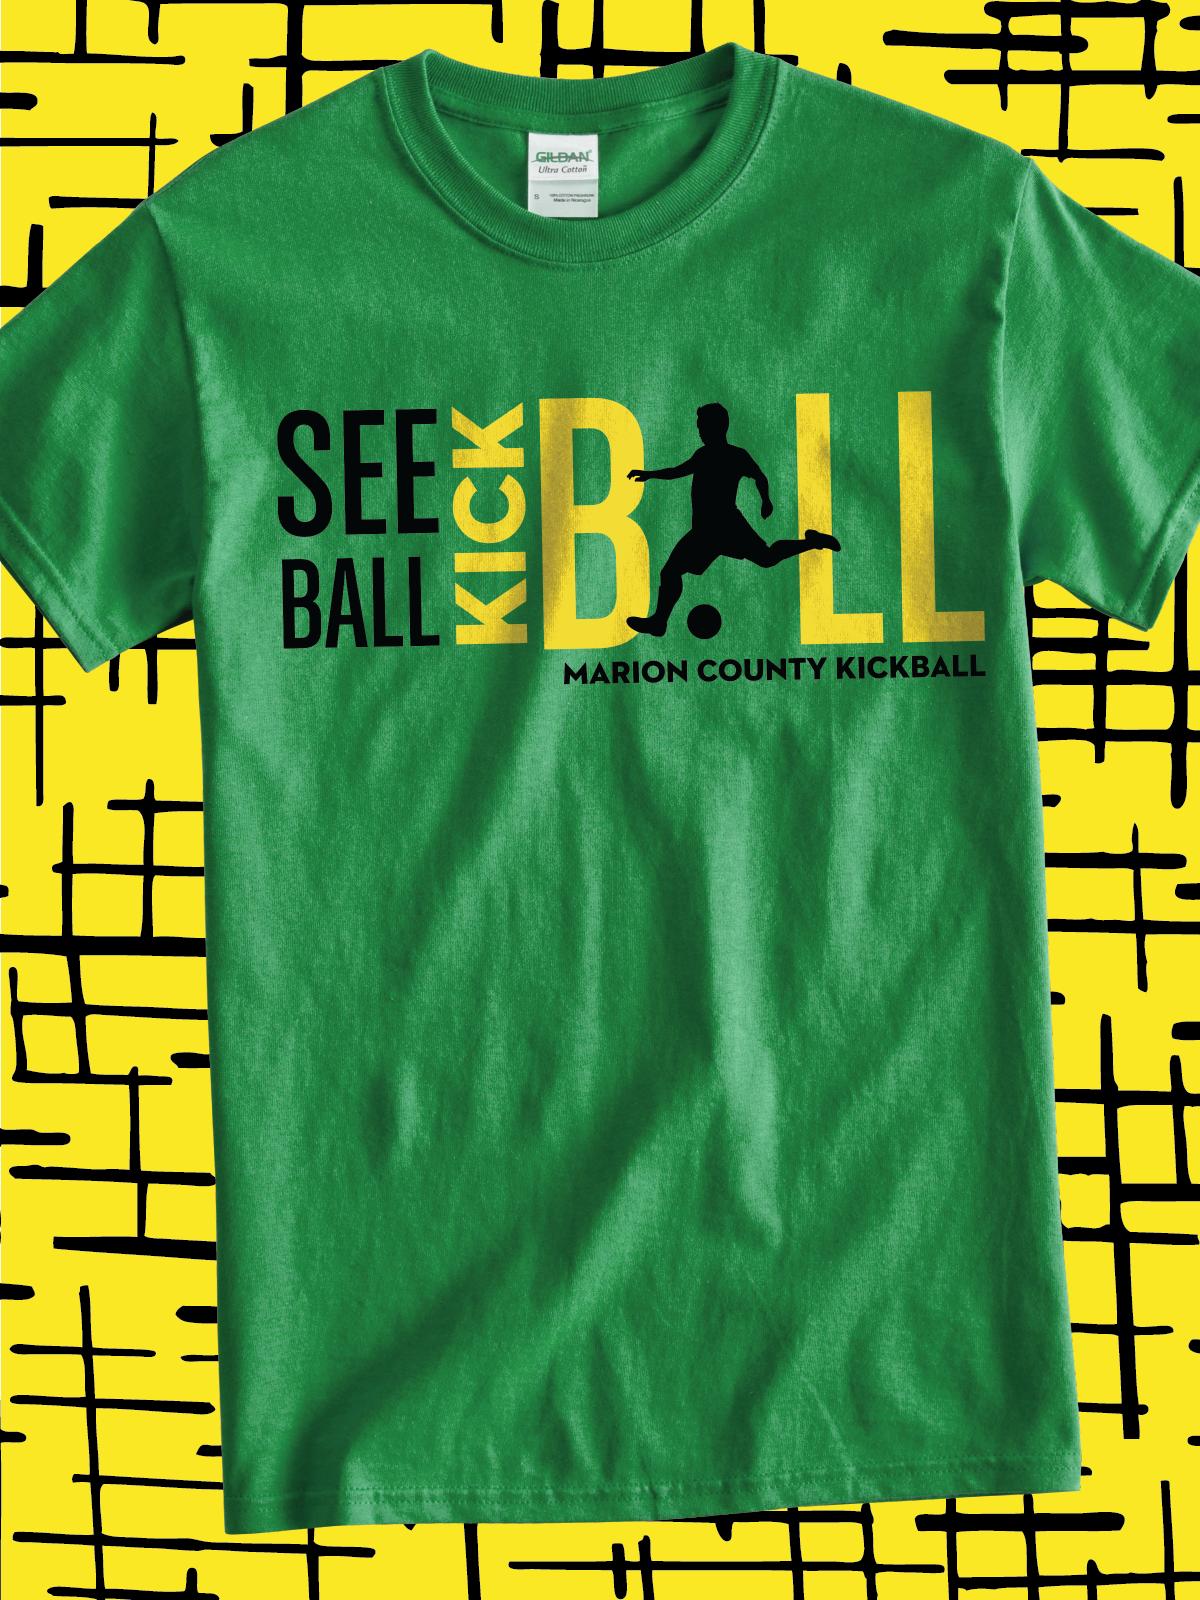 T shirt design jonesboro ar - See Ball Kick Ball Funny Design Idea For Custom Kickball Or Soccer Jerseys T